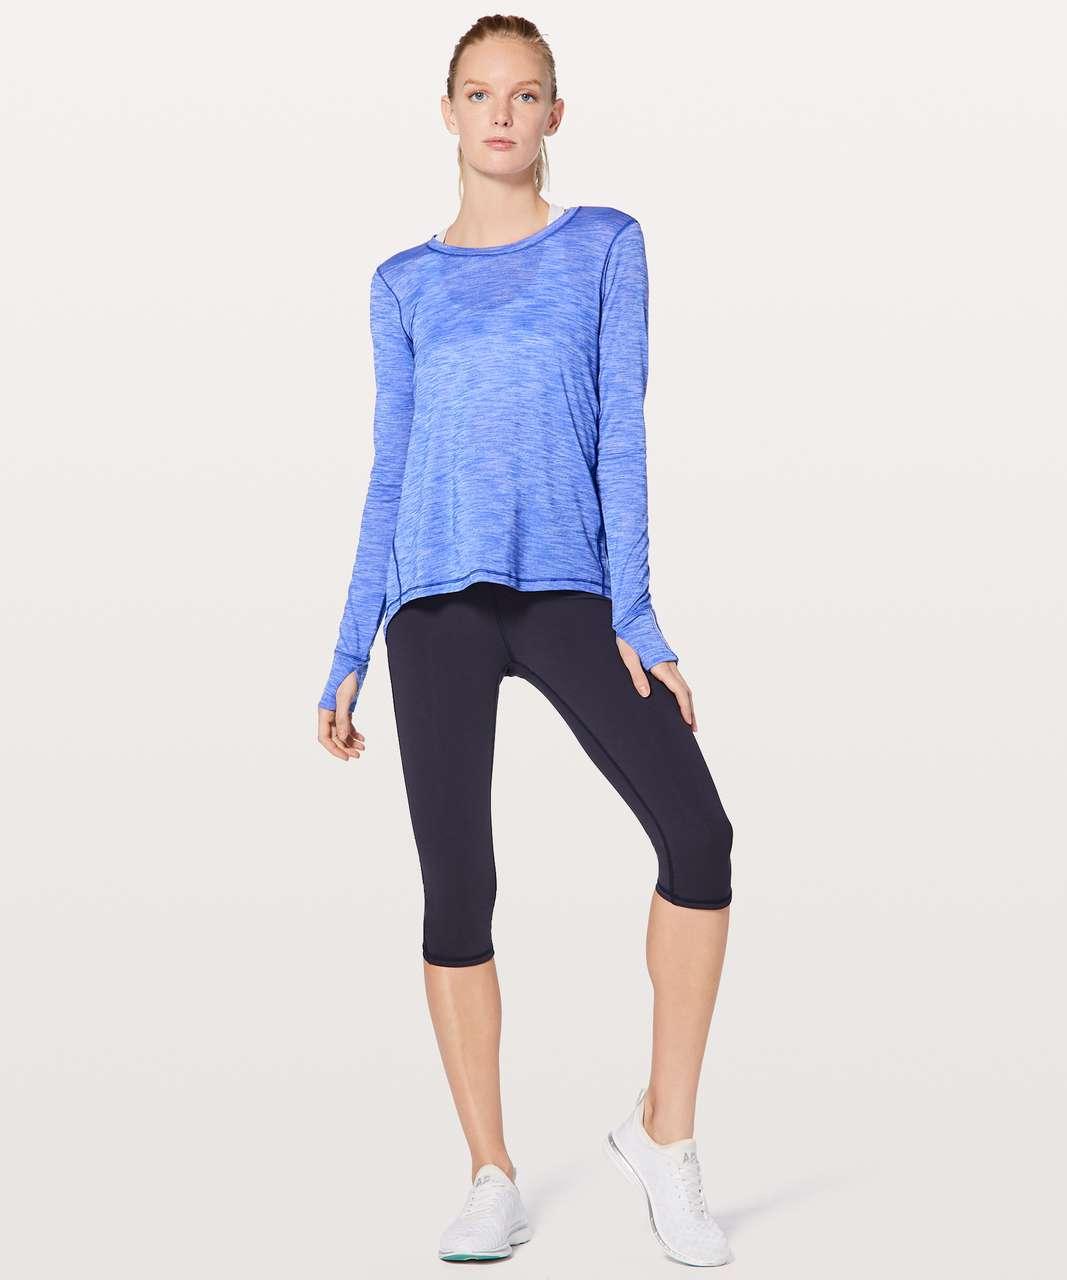 Lululemon Beat The Heat Long Sleeve - Heathered Blazer Blue